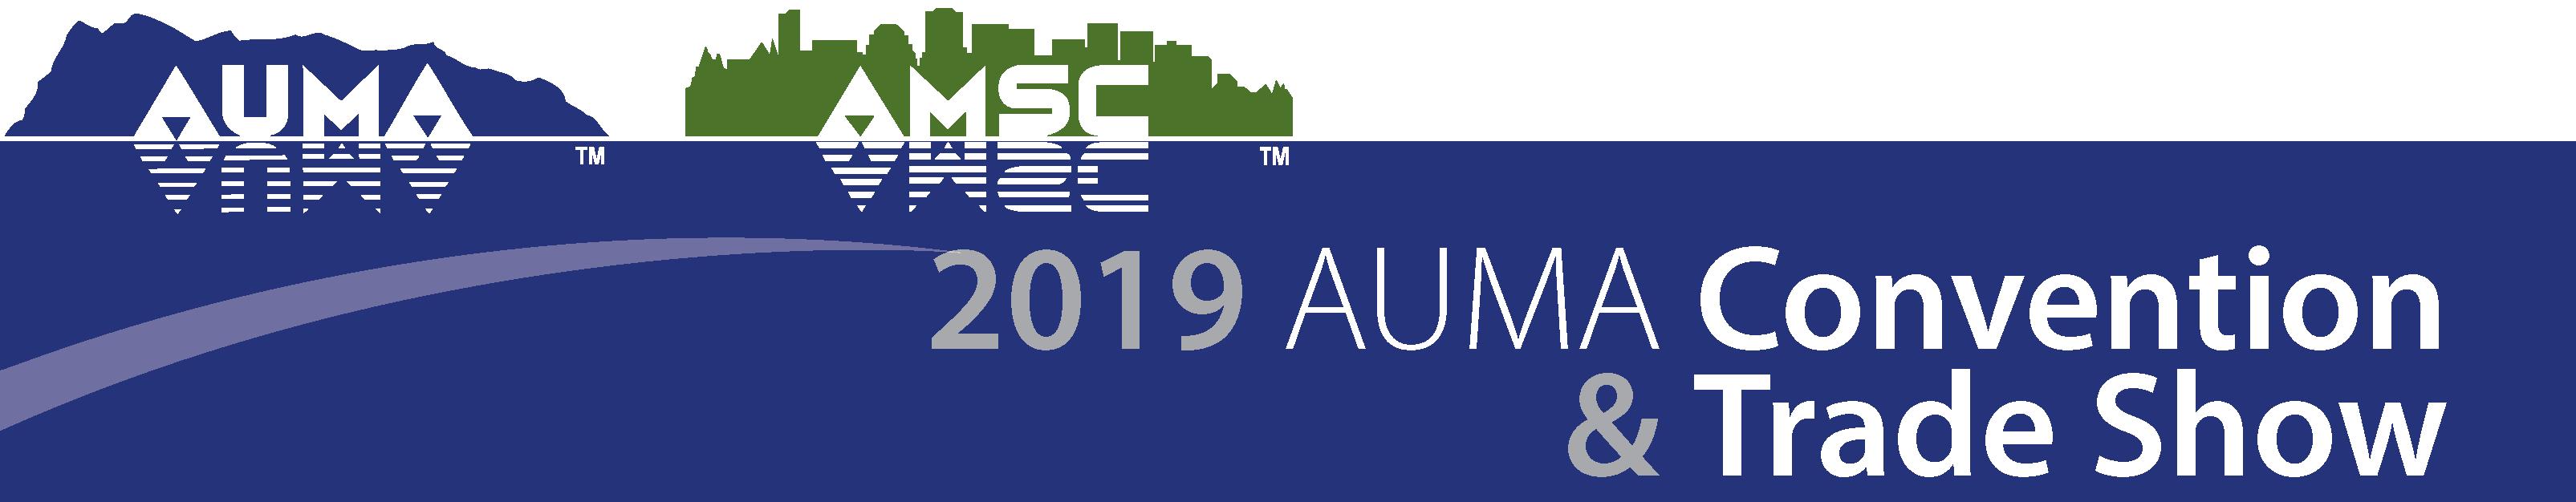 2019 AMSC Trade Show at the AUMA Convention